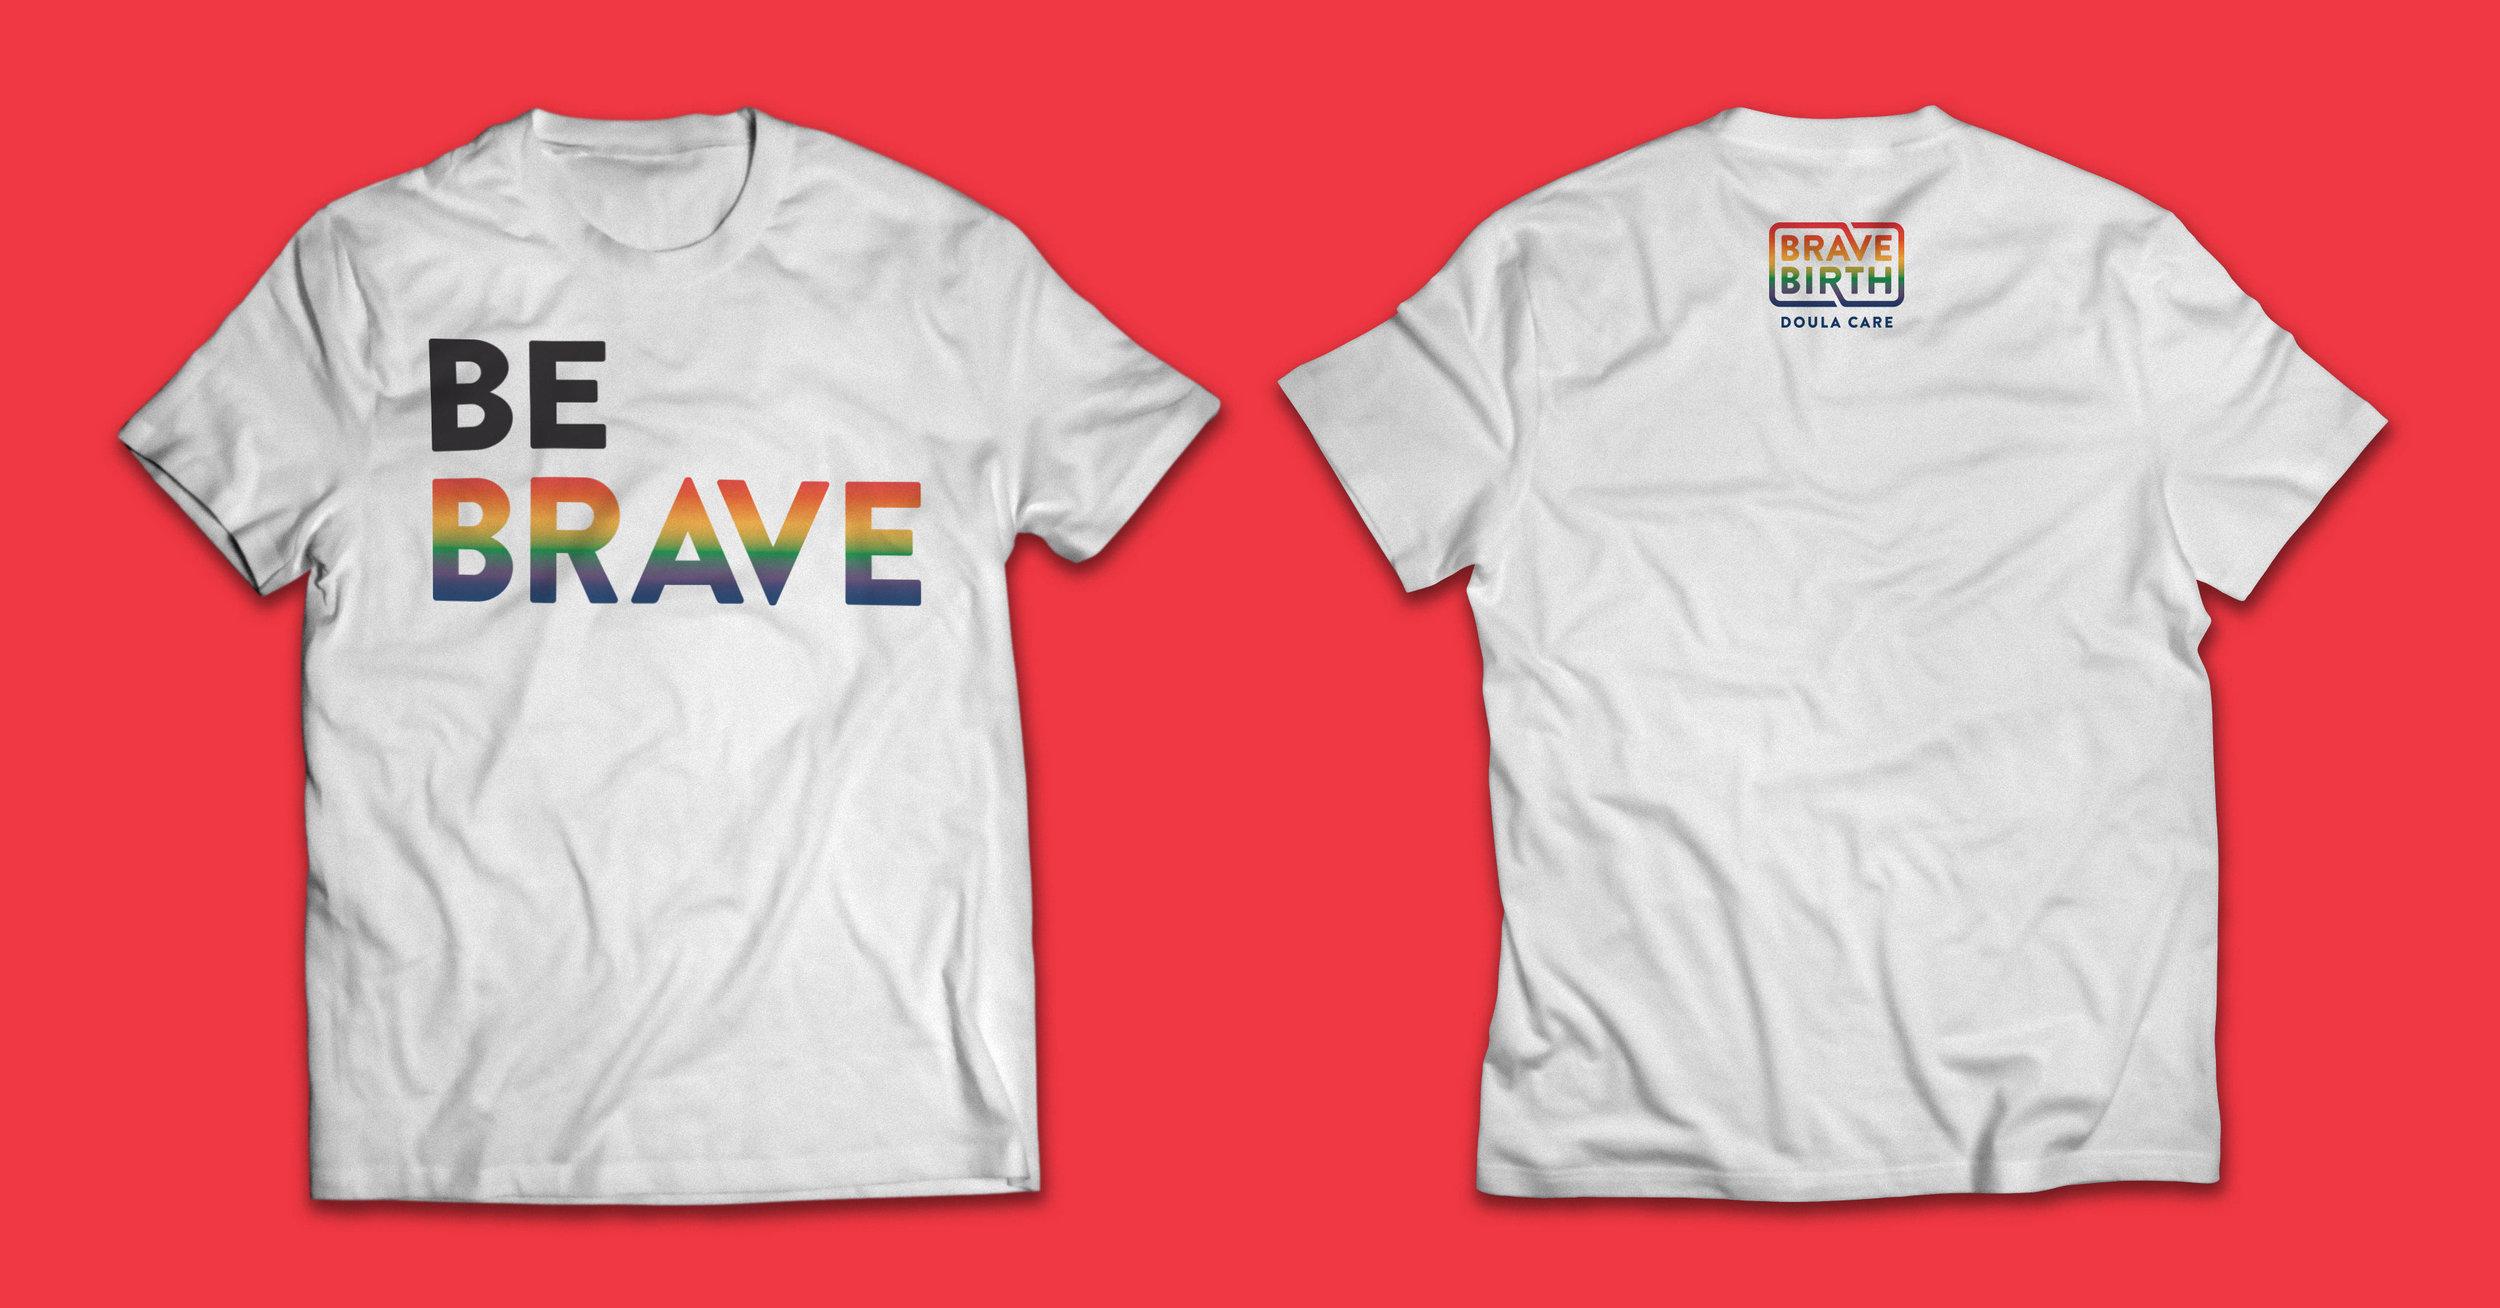 Brave_Birth_tshirt_pride_parade_PDX_zilka.jpg